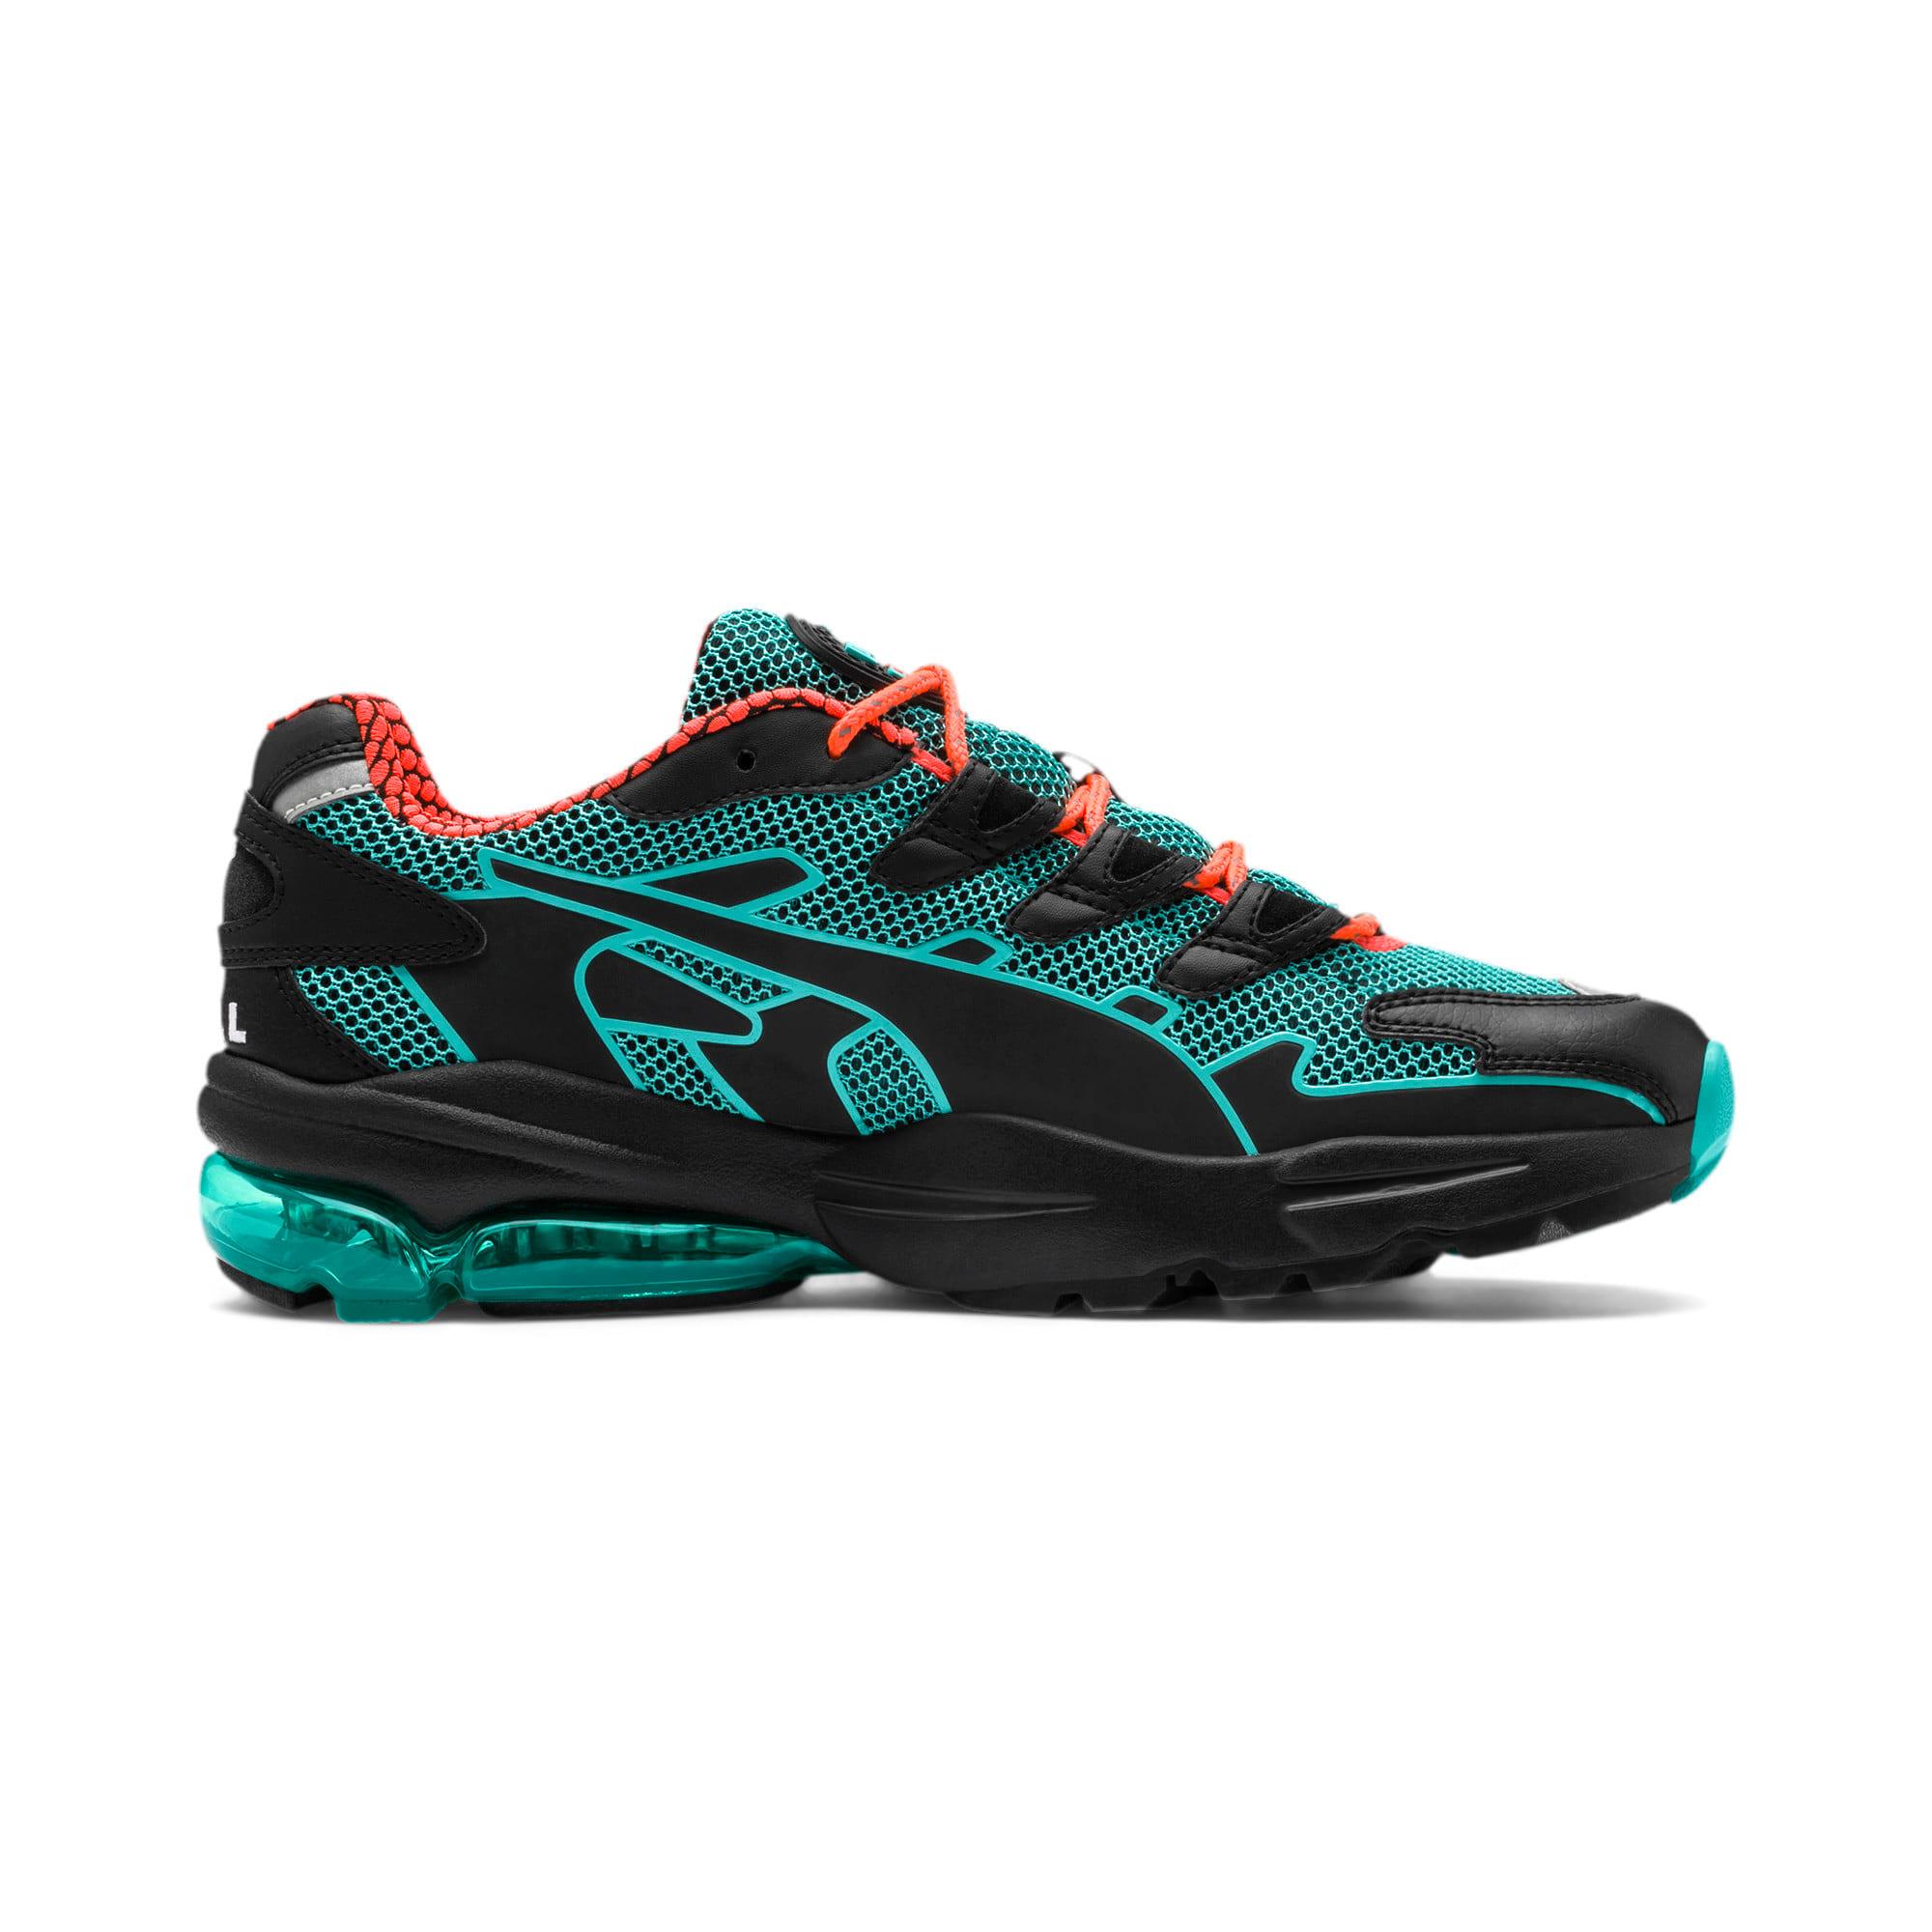 Thumbnail 6 of CELL Alien Kotto Sneakers, Puma Black-Blue Turquoise, medium